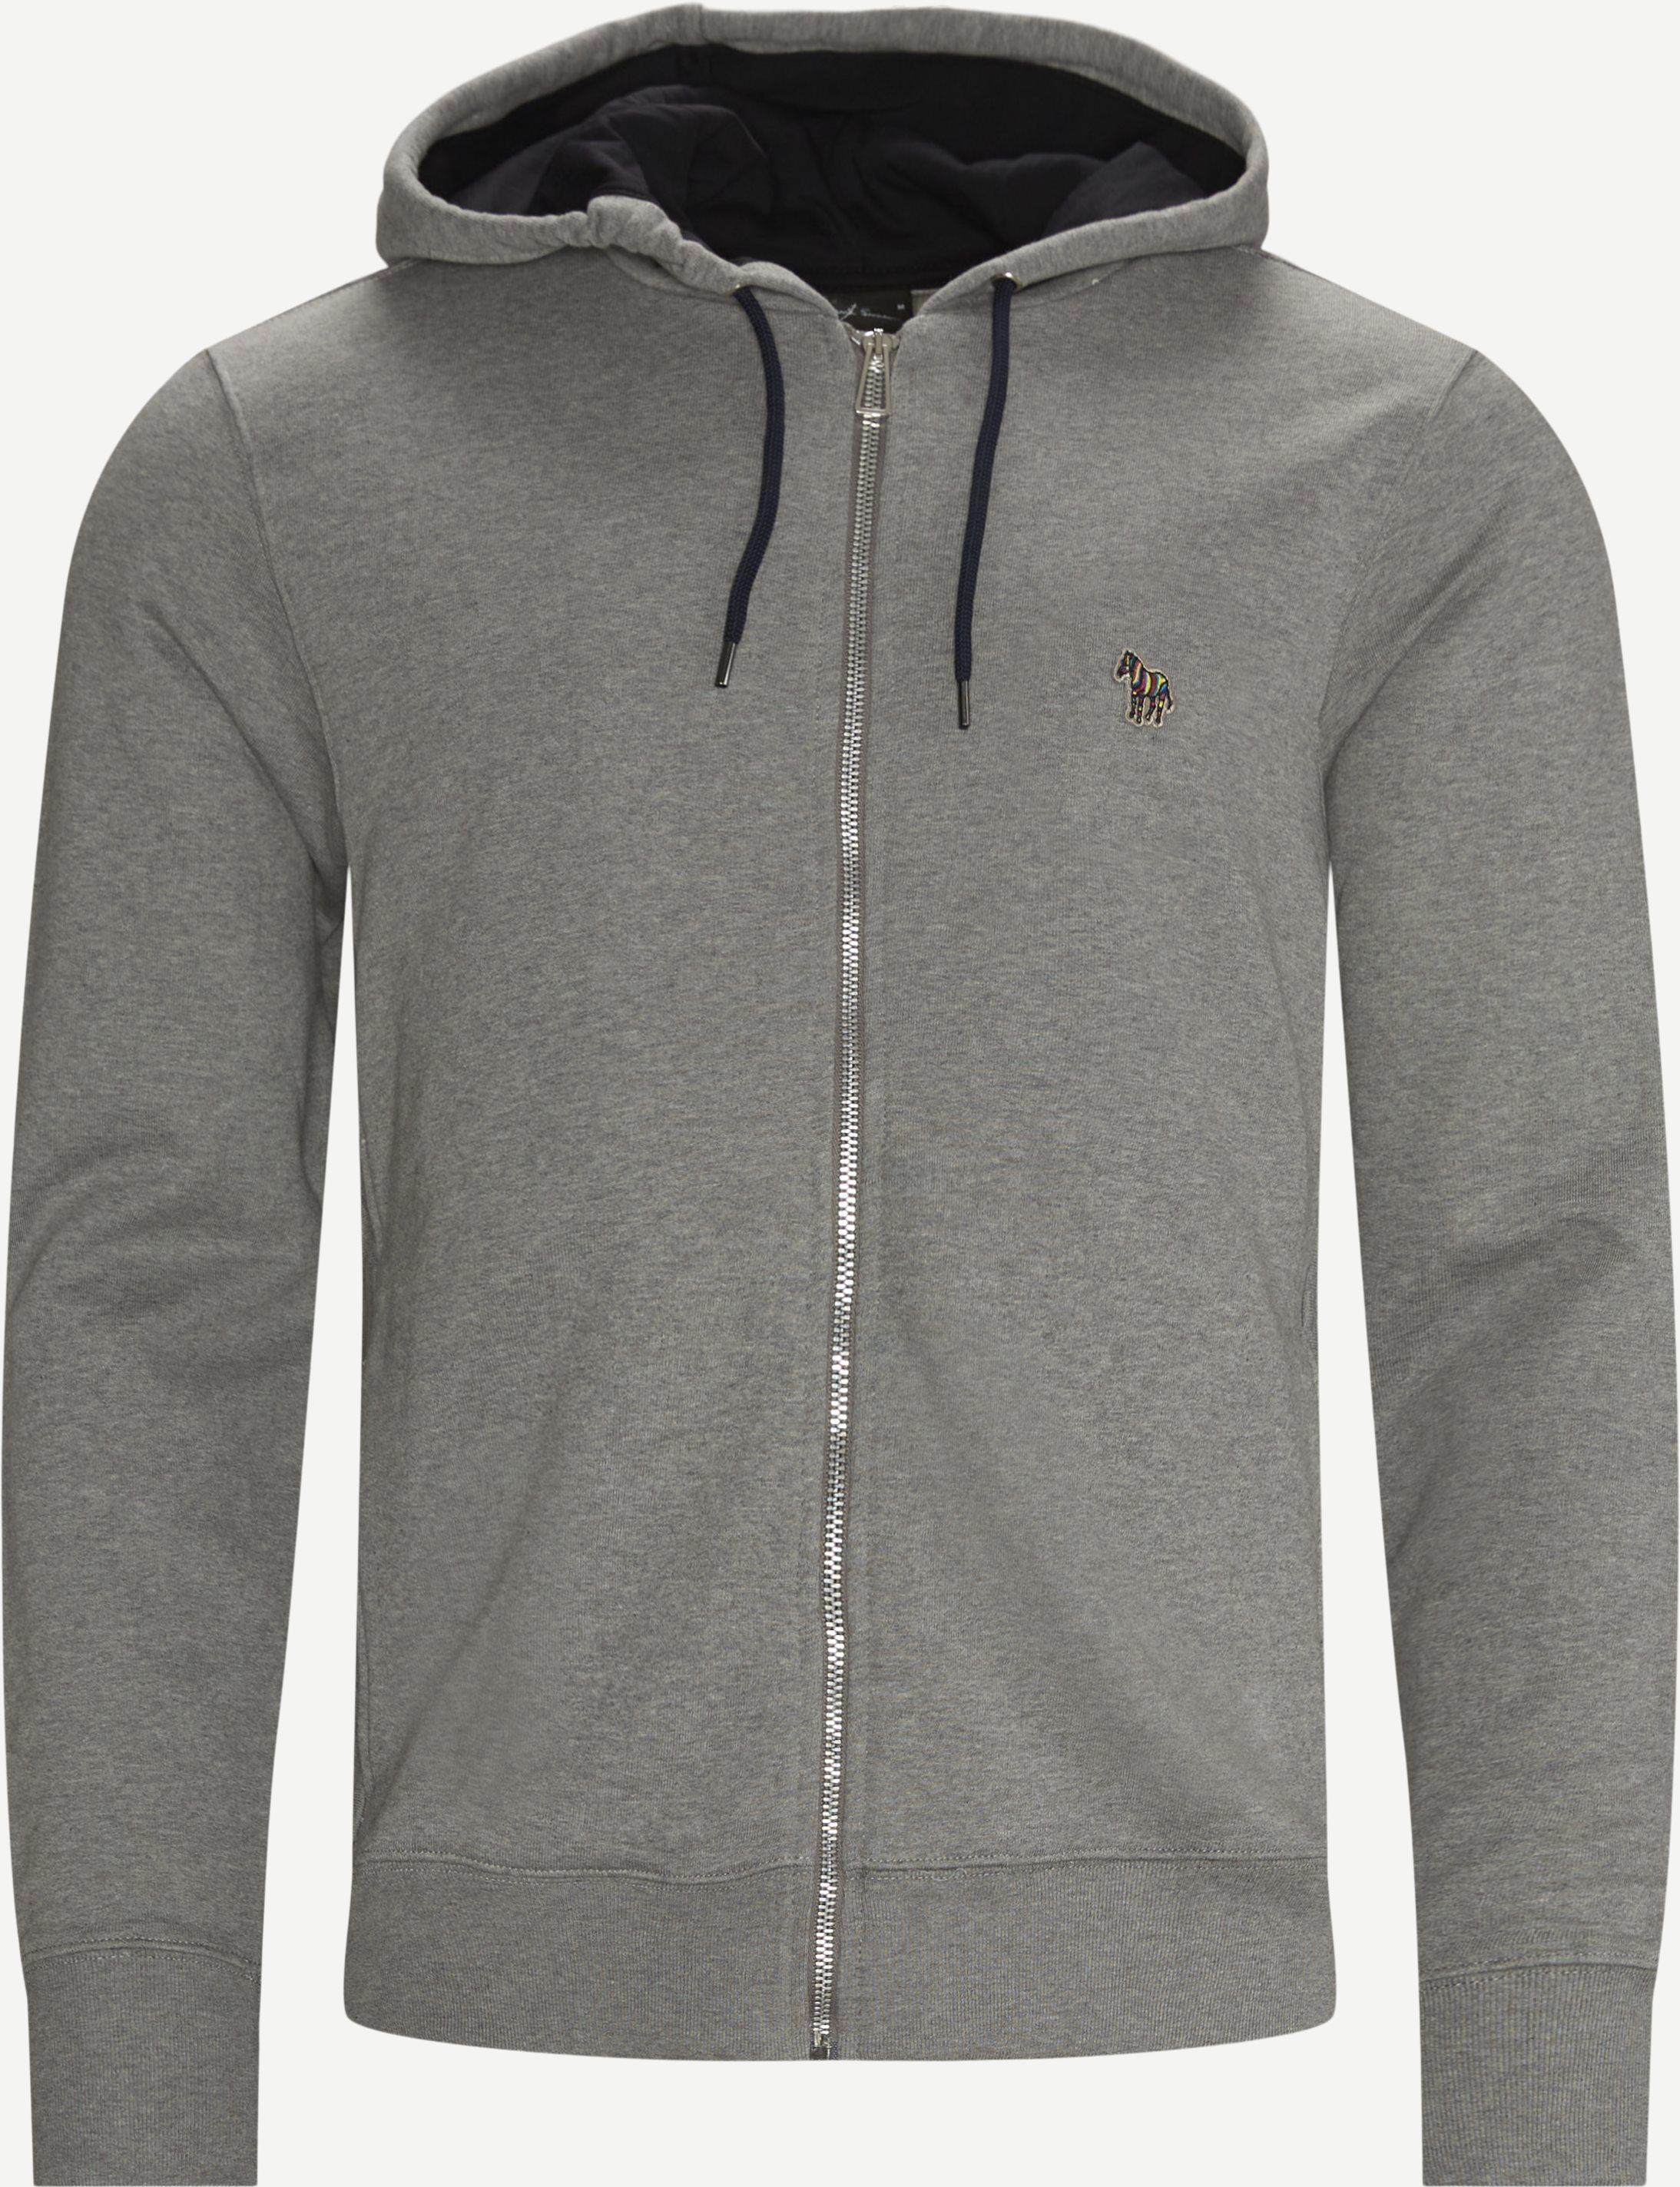 Sweatshirts - Regular fit - Grey